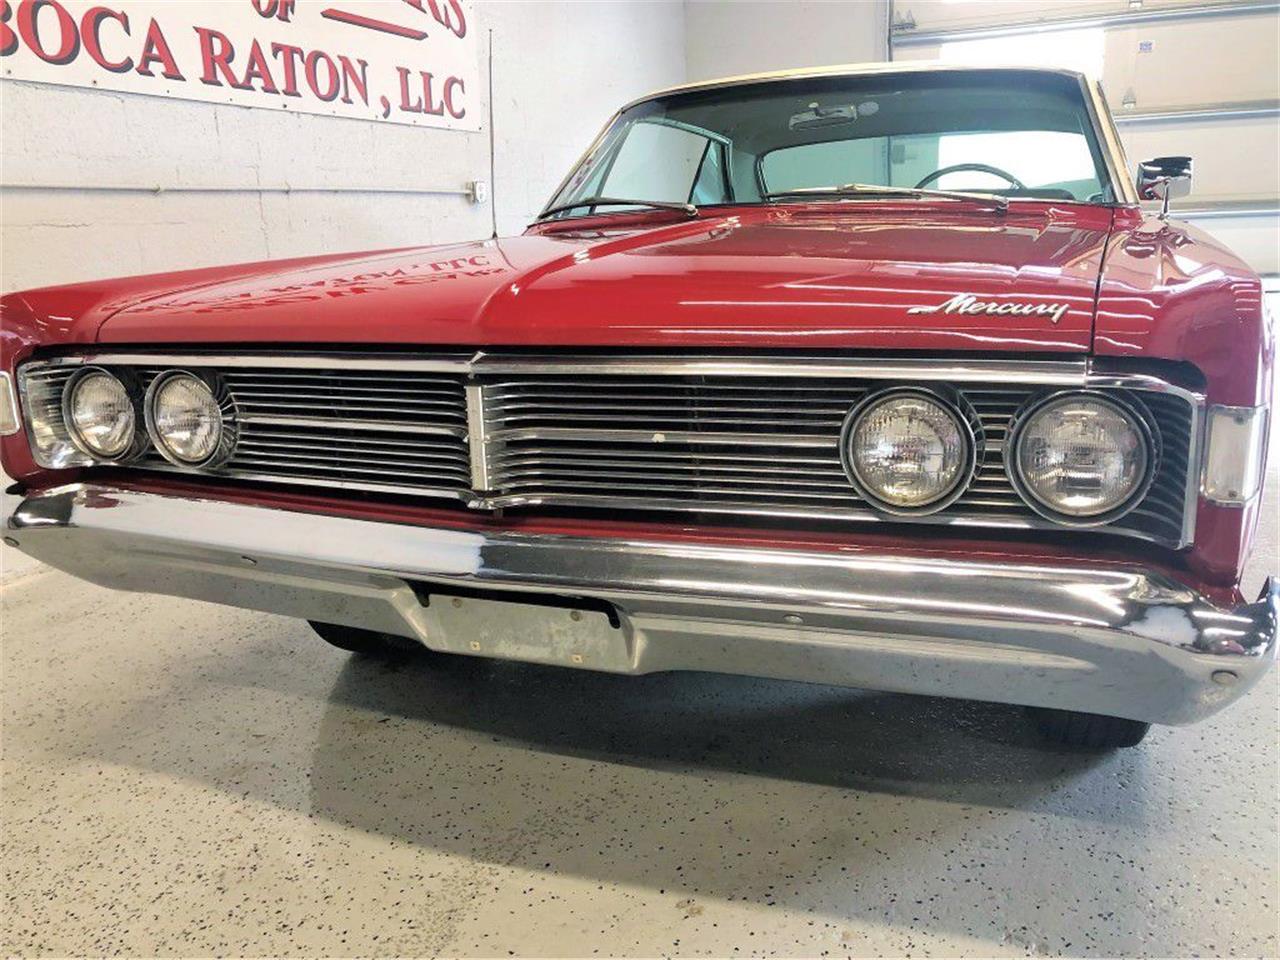 1966 Mercury S55 (CC-1334832) for sale in Boca Raton, Florida